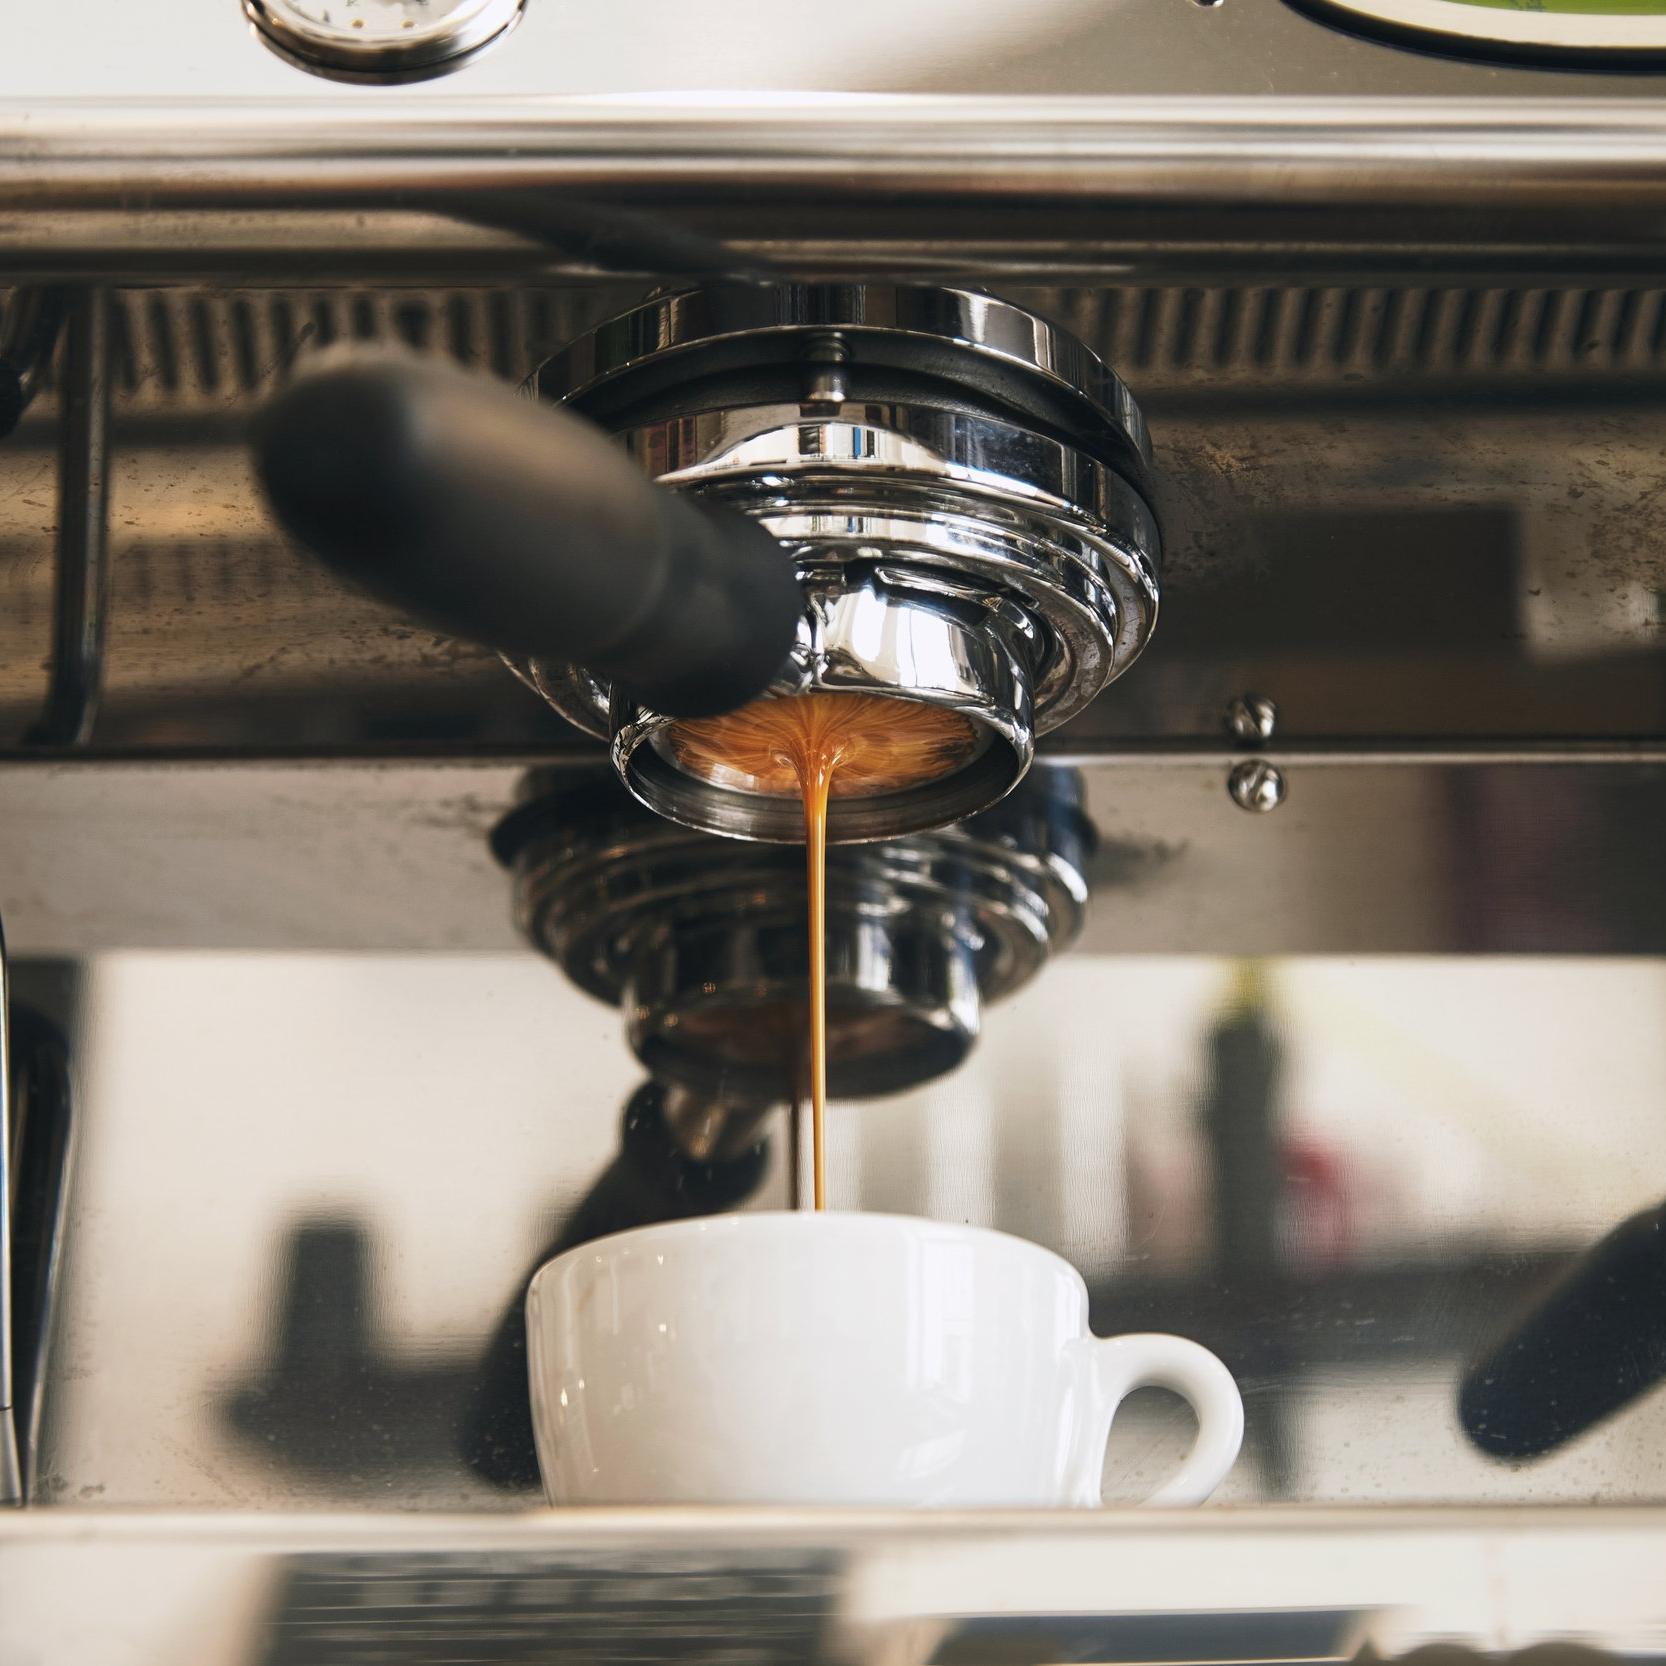 Coffee Pour - AdobeStock_107091768.jpeg